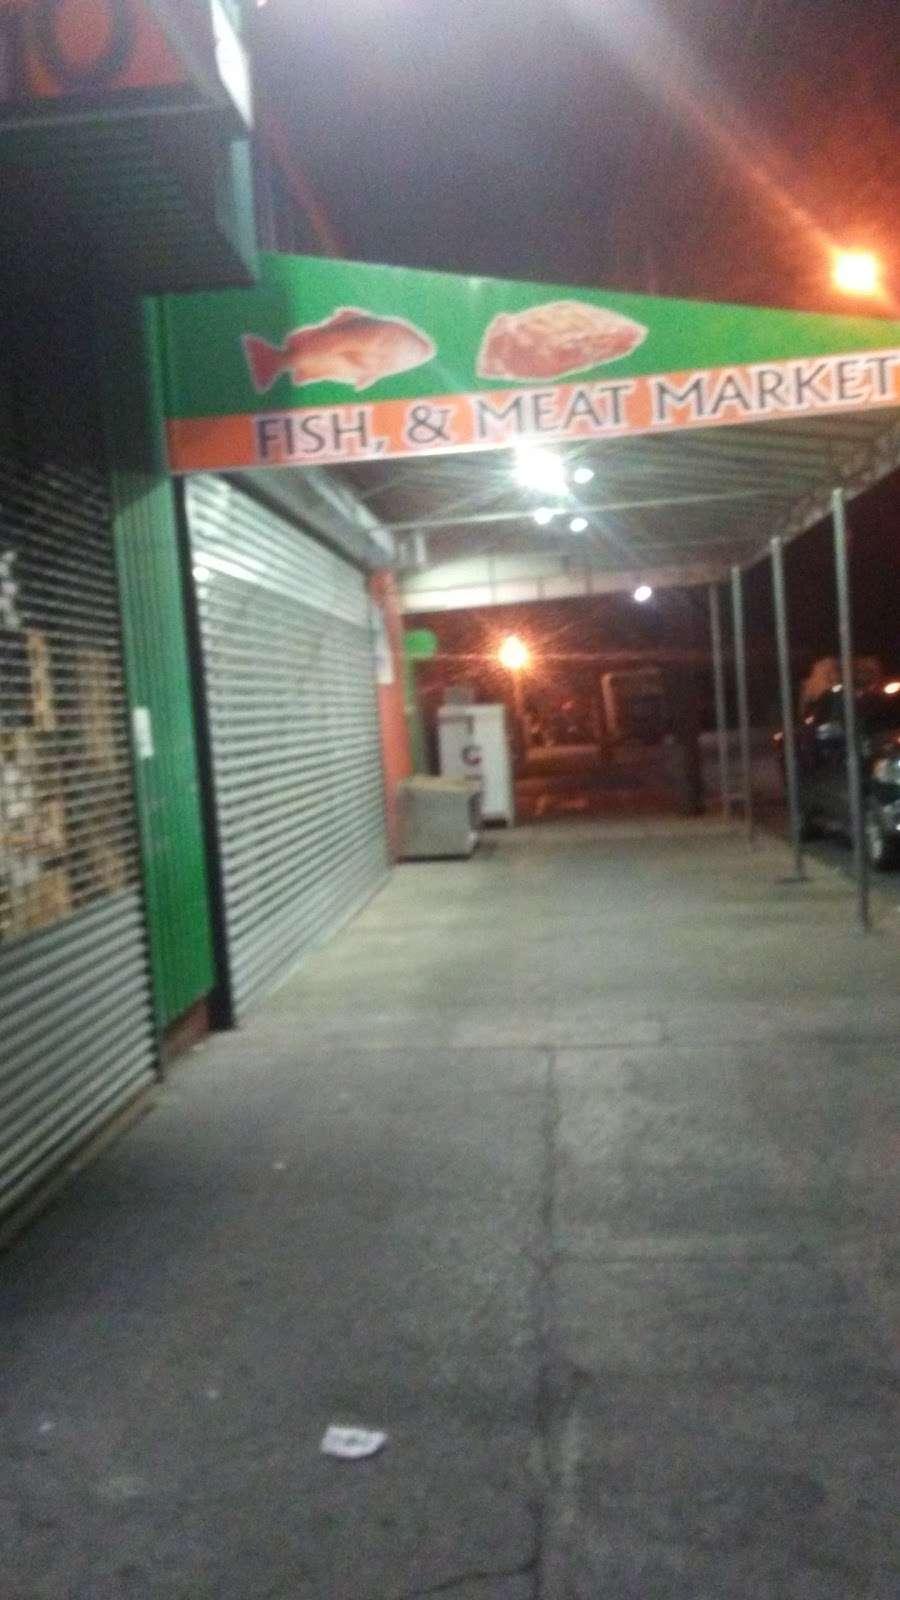 Food Saver New York - store    Photo 3 of 8   Address: 412 E 83rd St, Brooklyn, NY 11236, USA   Phone: (718) 209-9300